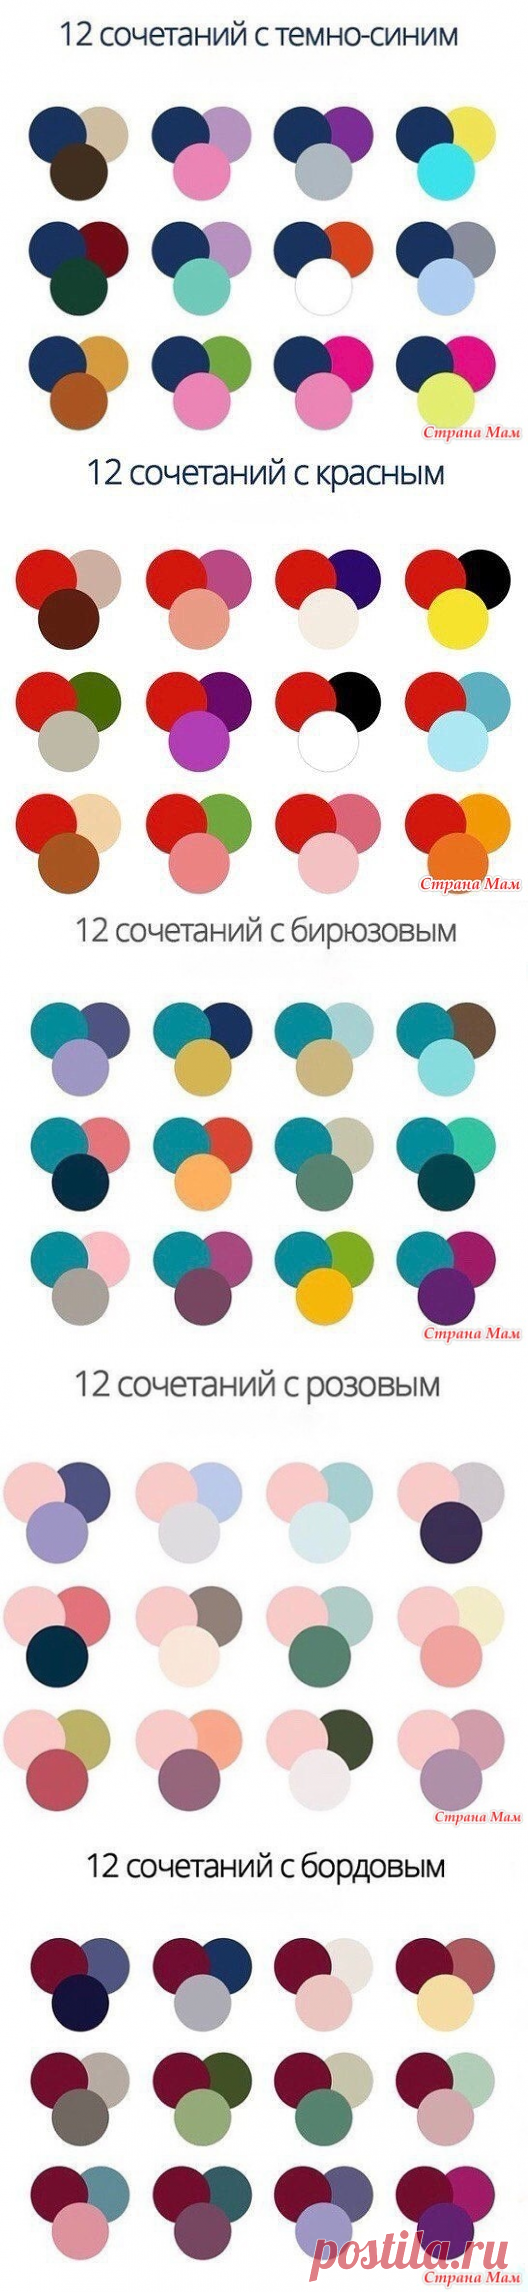 . Сочетания 3-х цветов - Вязание - Страна Мам